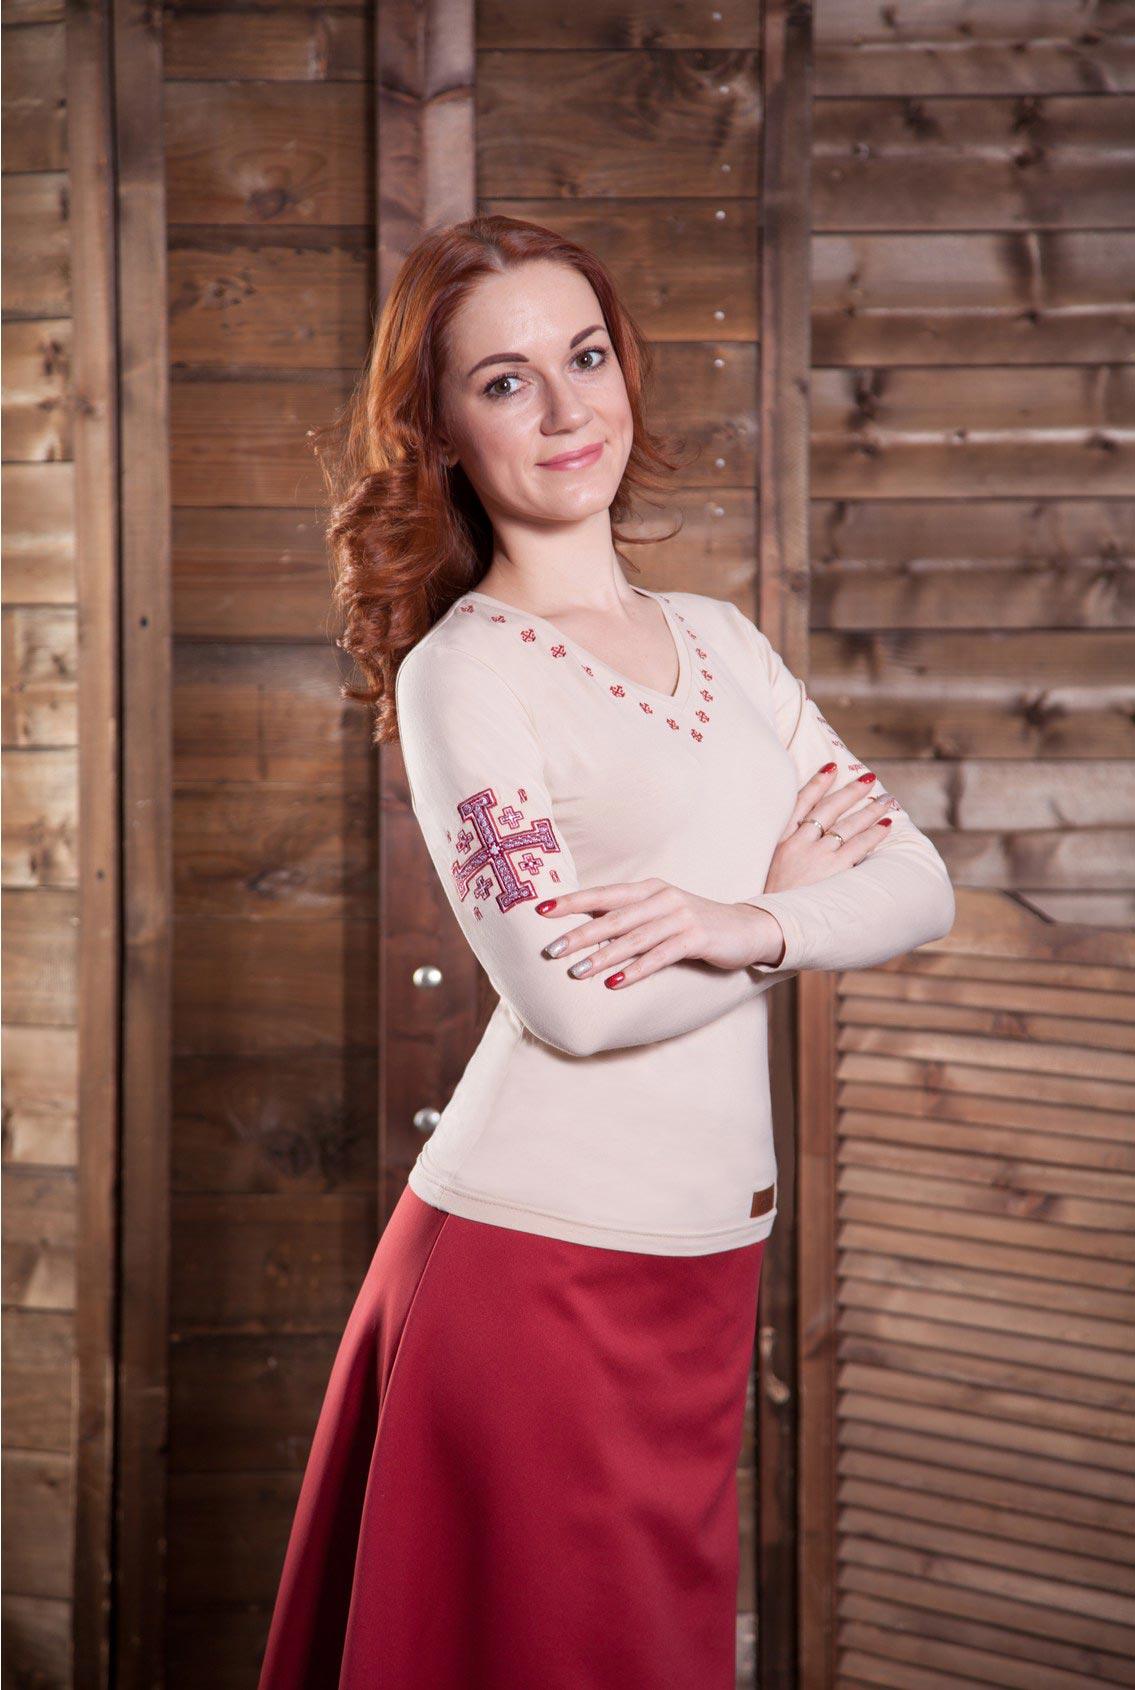 женская православная мода, women's orthodox fashion